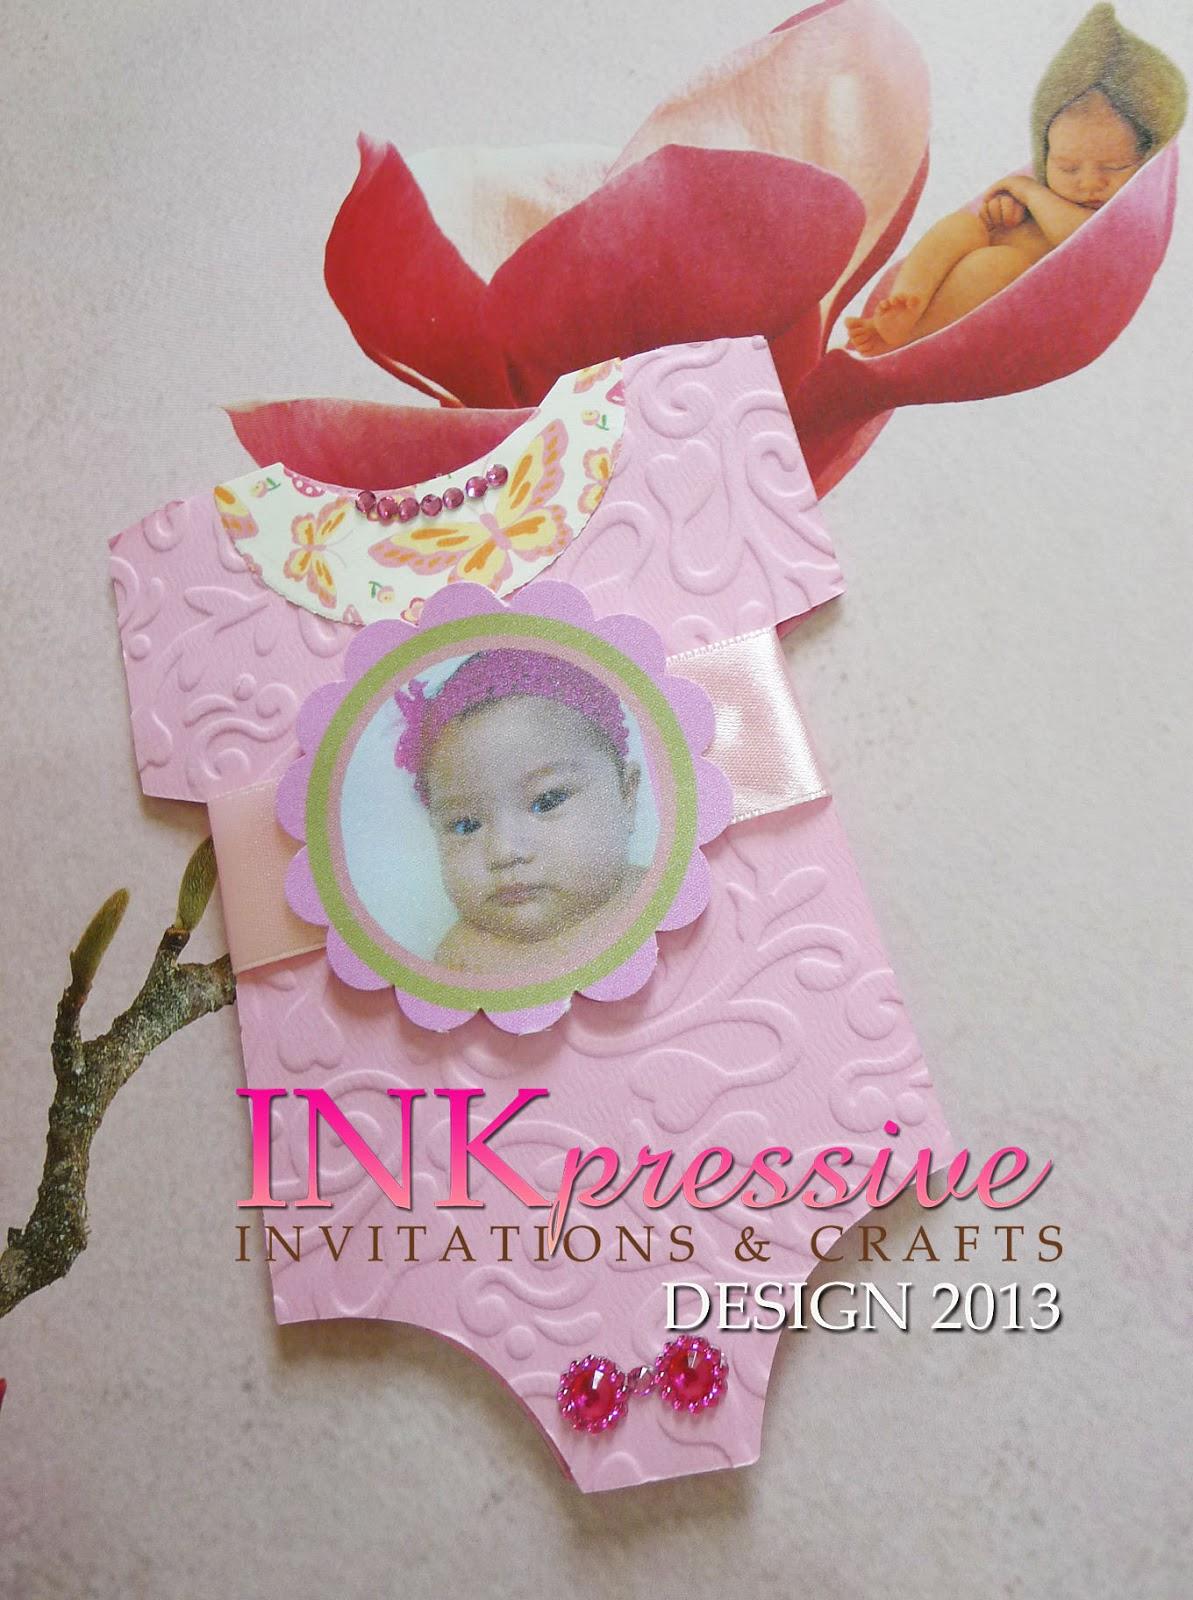 Pink Baby Onesie Baptism Invitation | INKPRESSIVE INVITATIONS